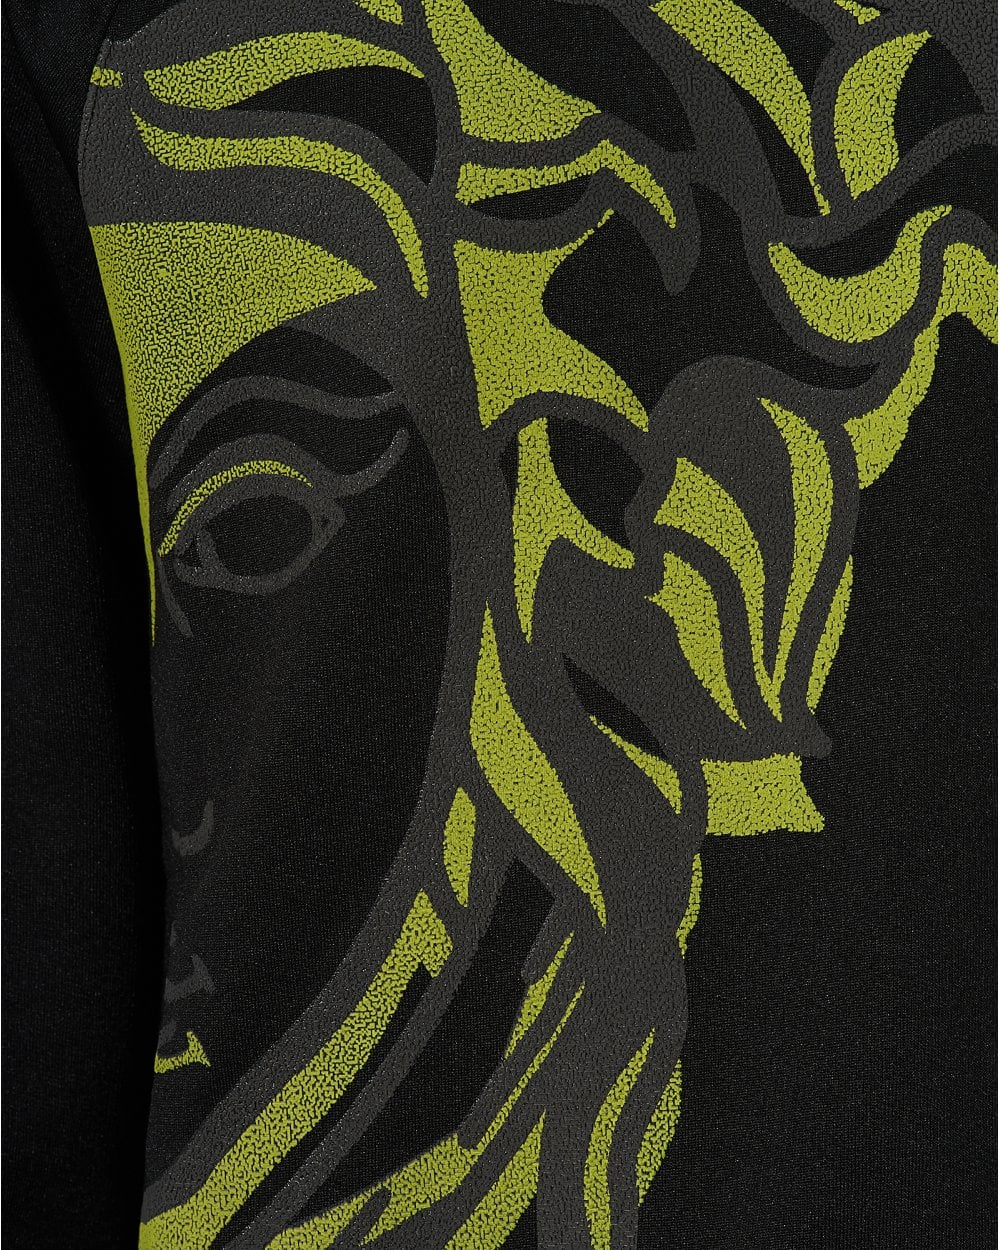 e764ccee0 Versace Collection Mens 1/2 Medusa Sweatshirt, Black Sweat